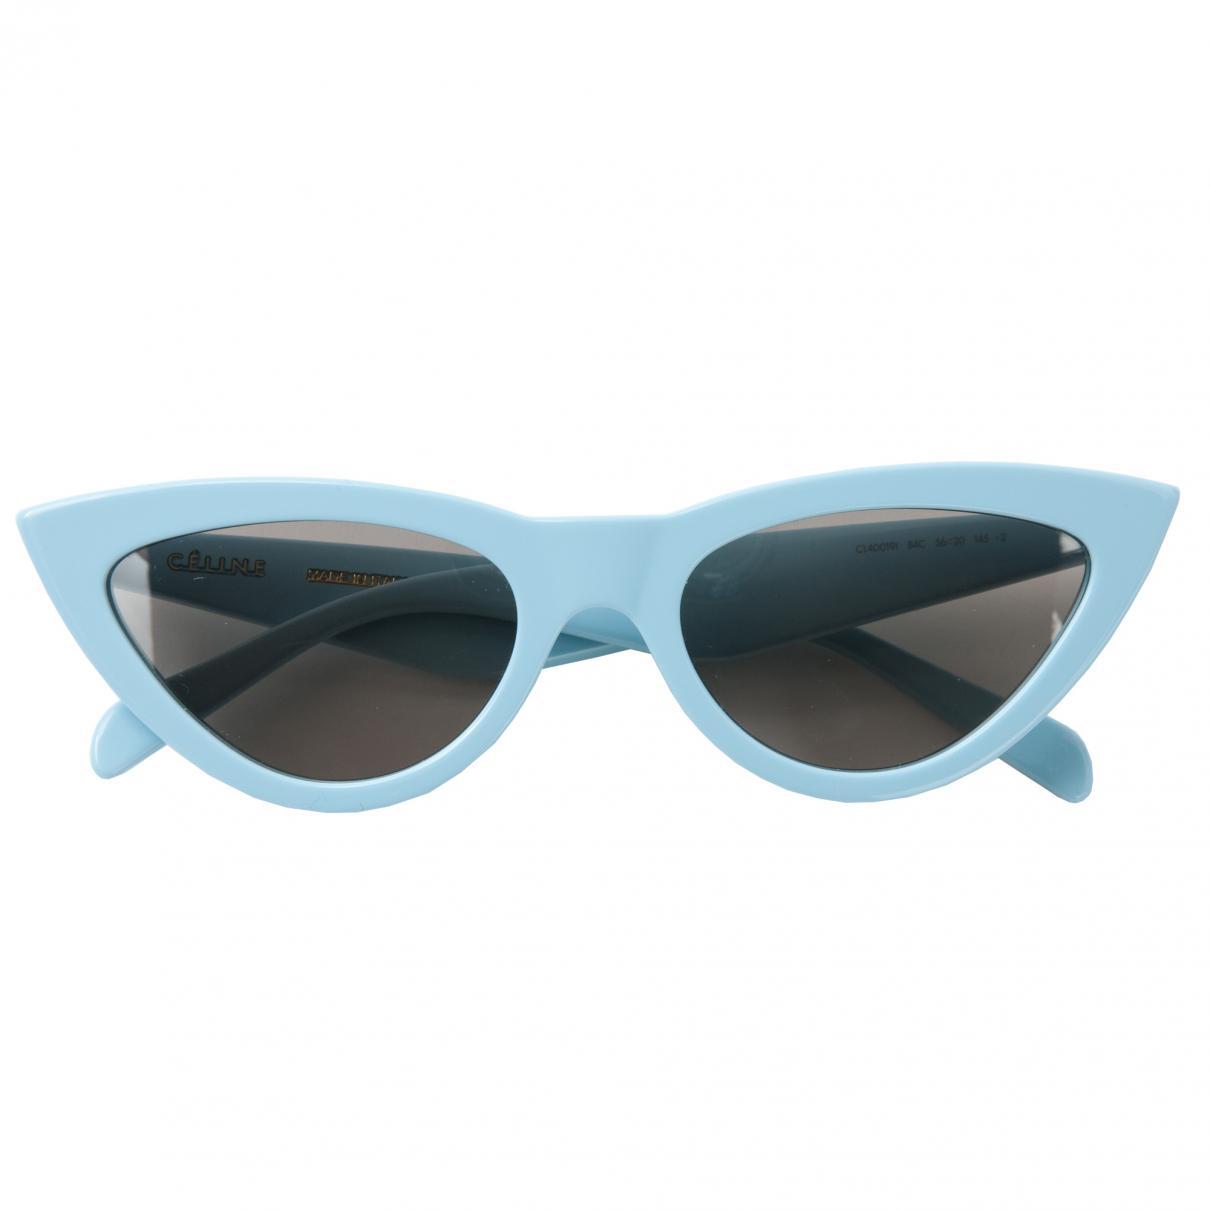 abf63a13ca Céline Pre-owned Sunglasses in Blue - Lyst